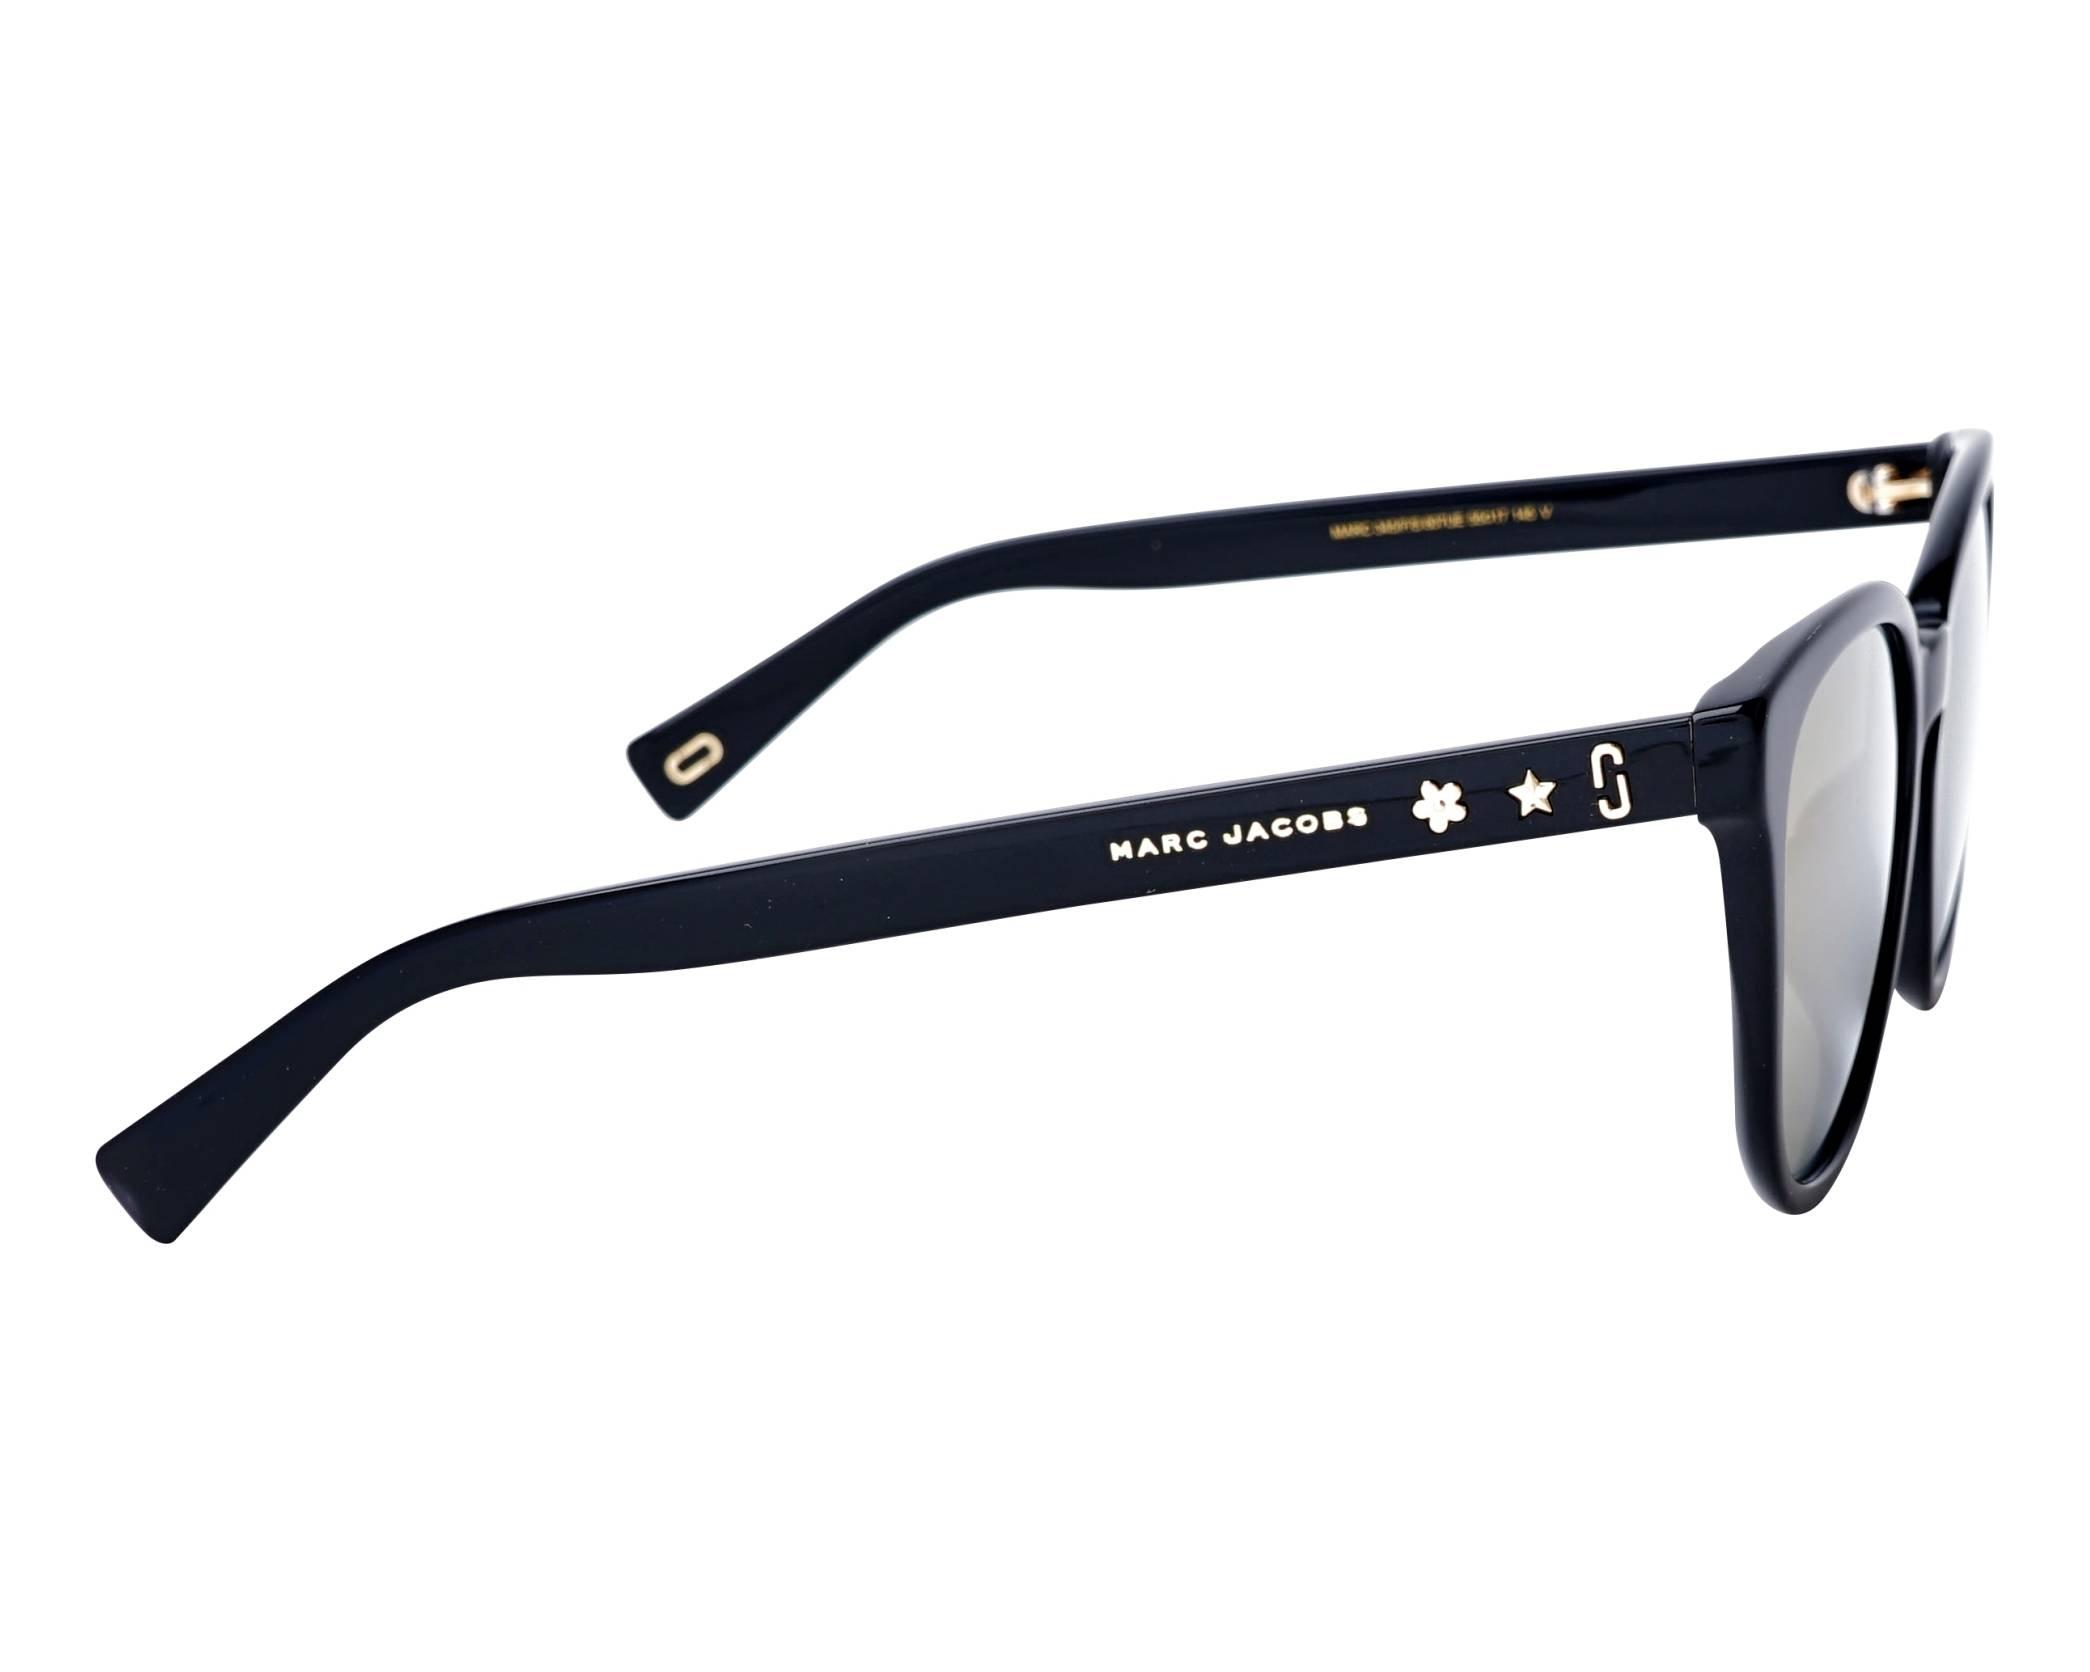 Sunglasses Marc Jacobs MARC-345-F-S 807UE 55-17 Black side view ea8a895b474